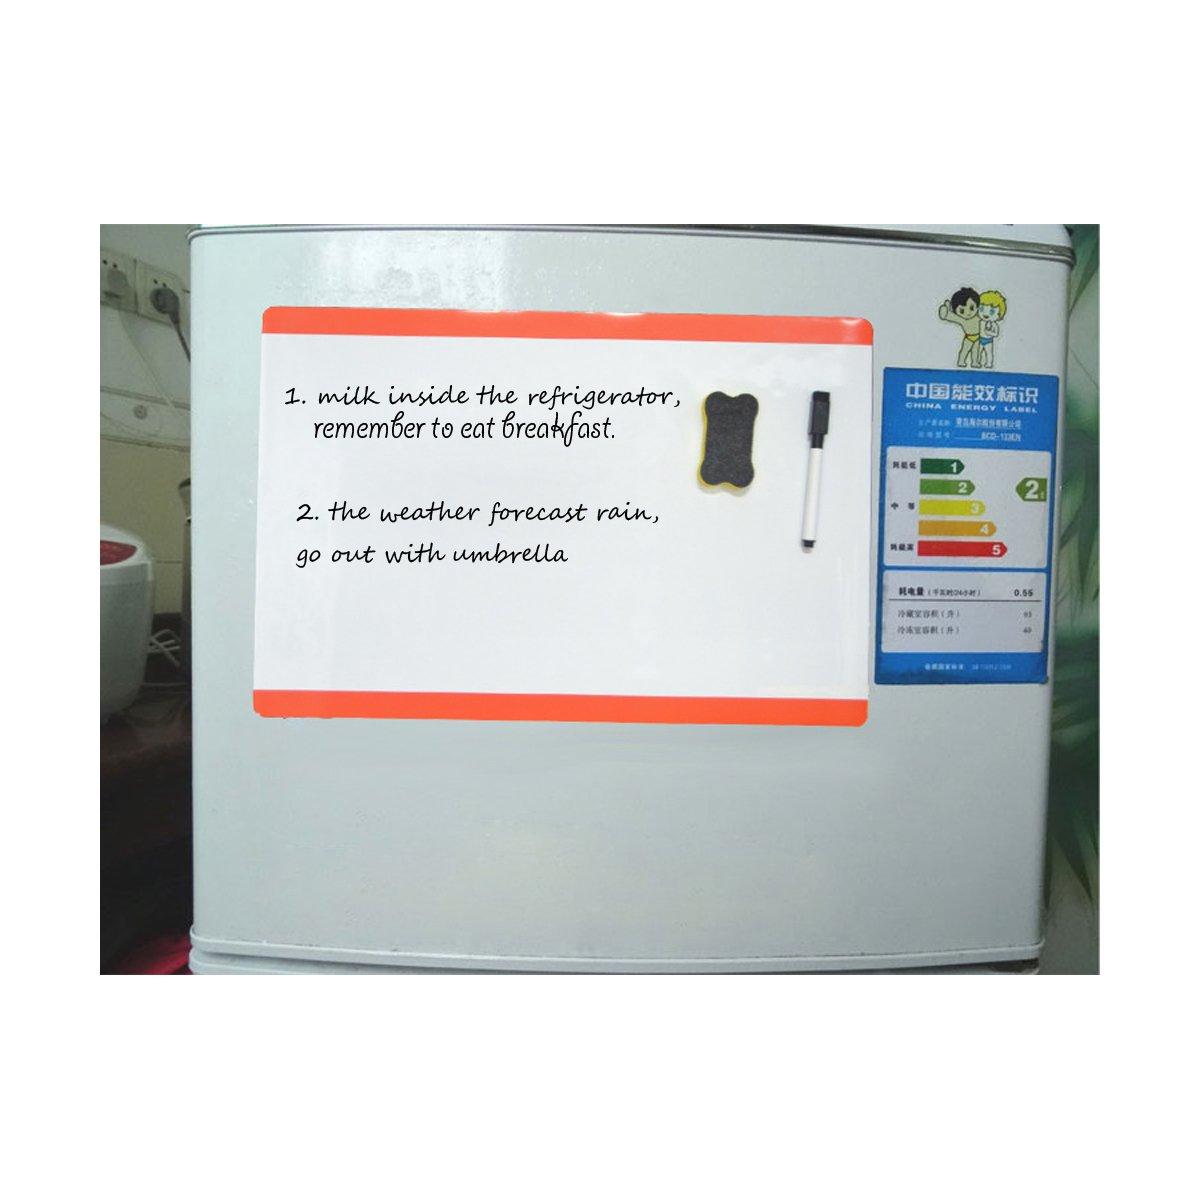 Long side black Villexun Planner Magnetic Board -Memo Board Fridge Magnet -Dry Erase Board Refrigerator -Dry Wipe White Magnetic Whiteboard Message Board and Reminder for Kitchen- A4 Size